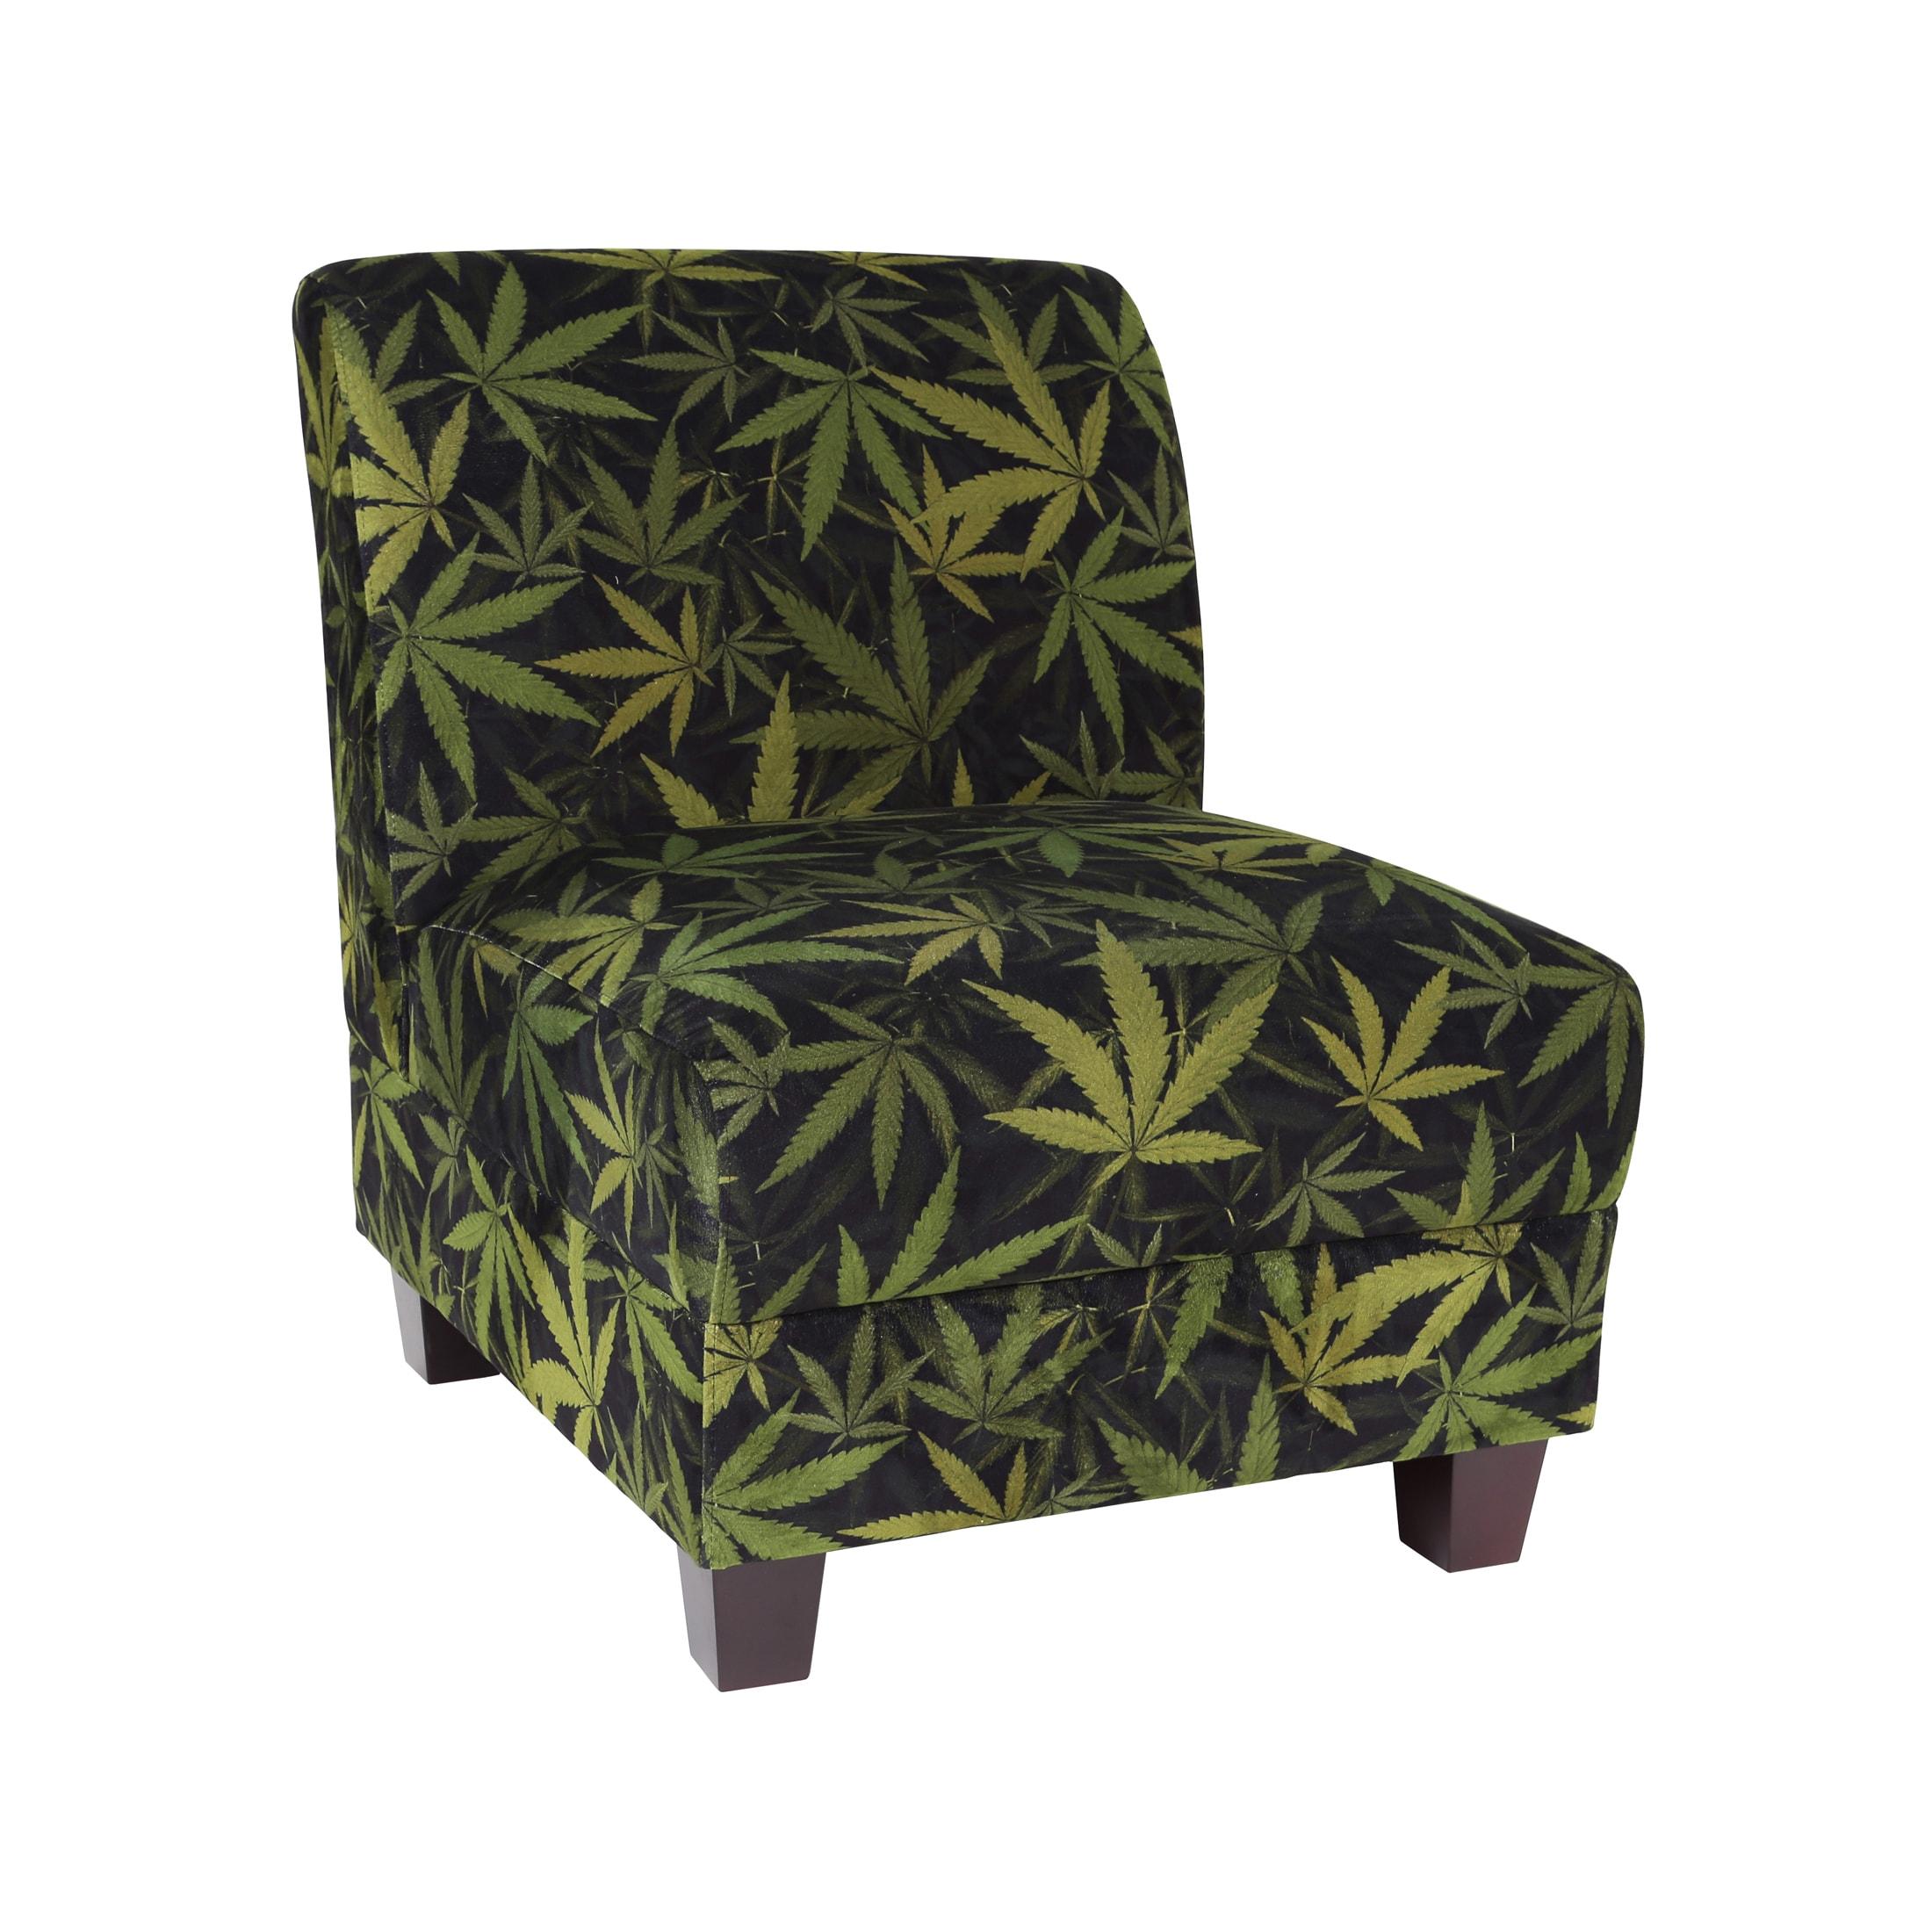 Mary Jane Furniture Kush Black and Green Botanical Marijuana Print